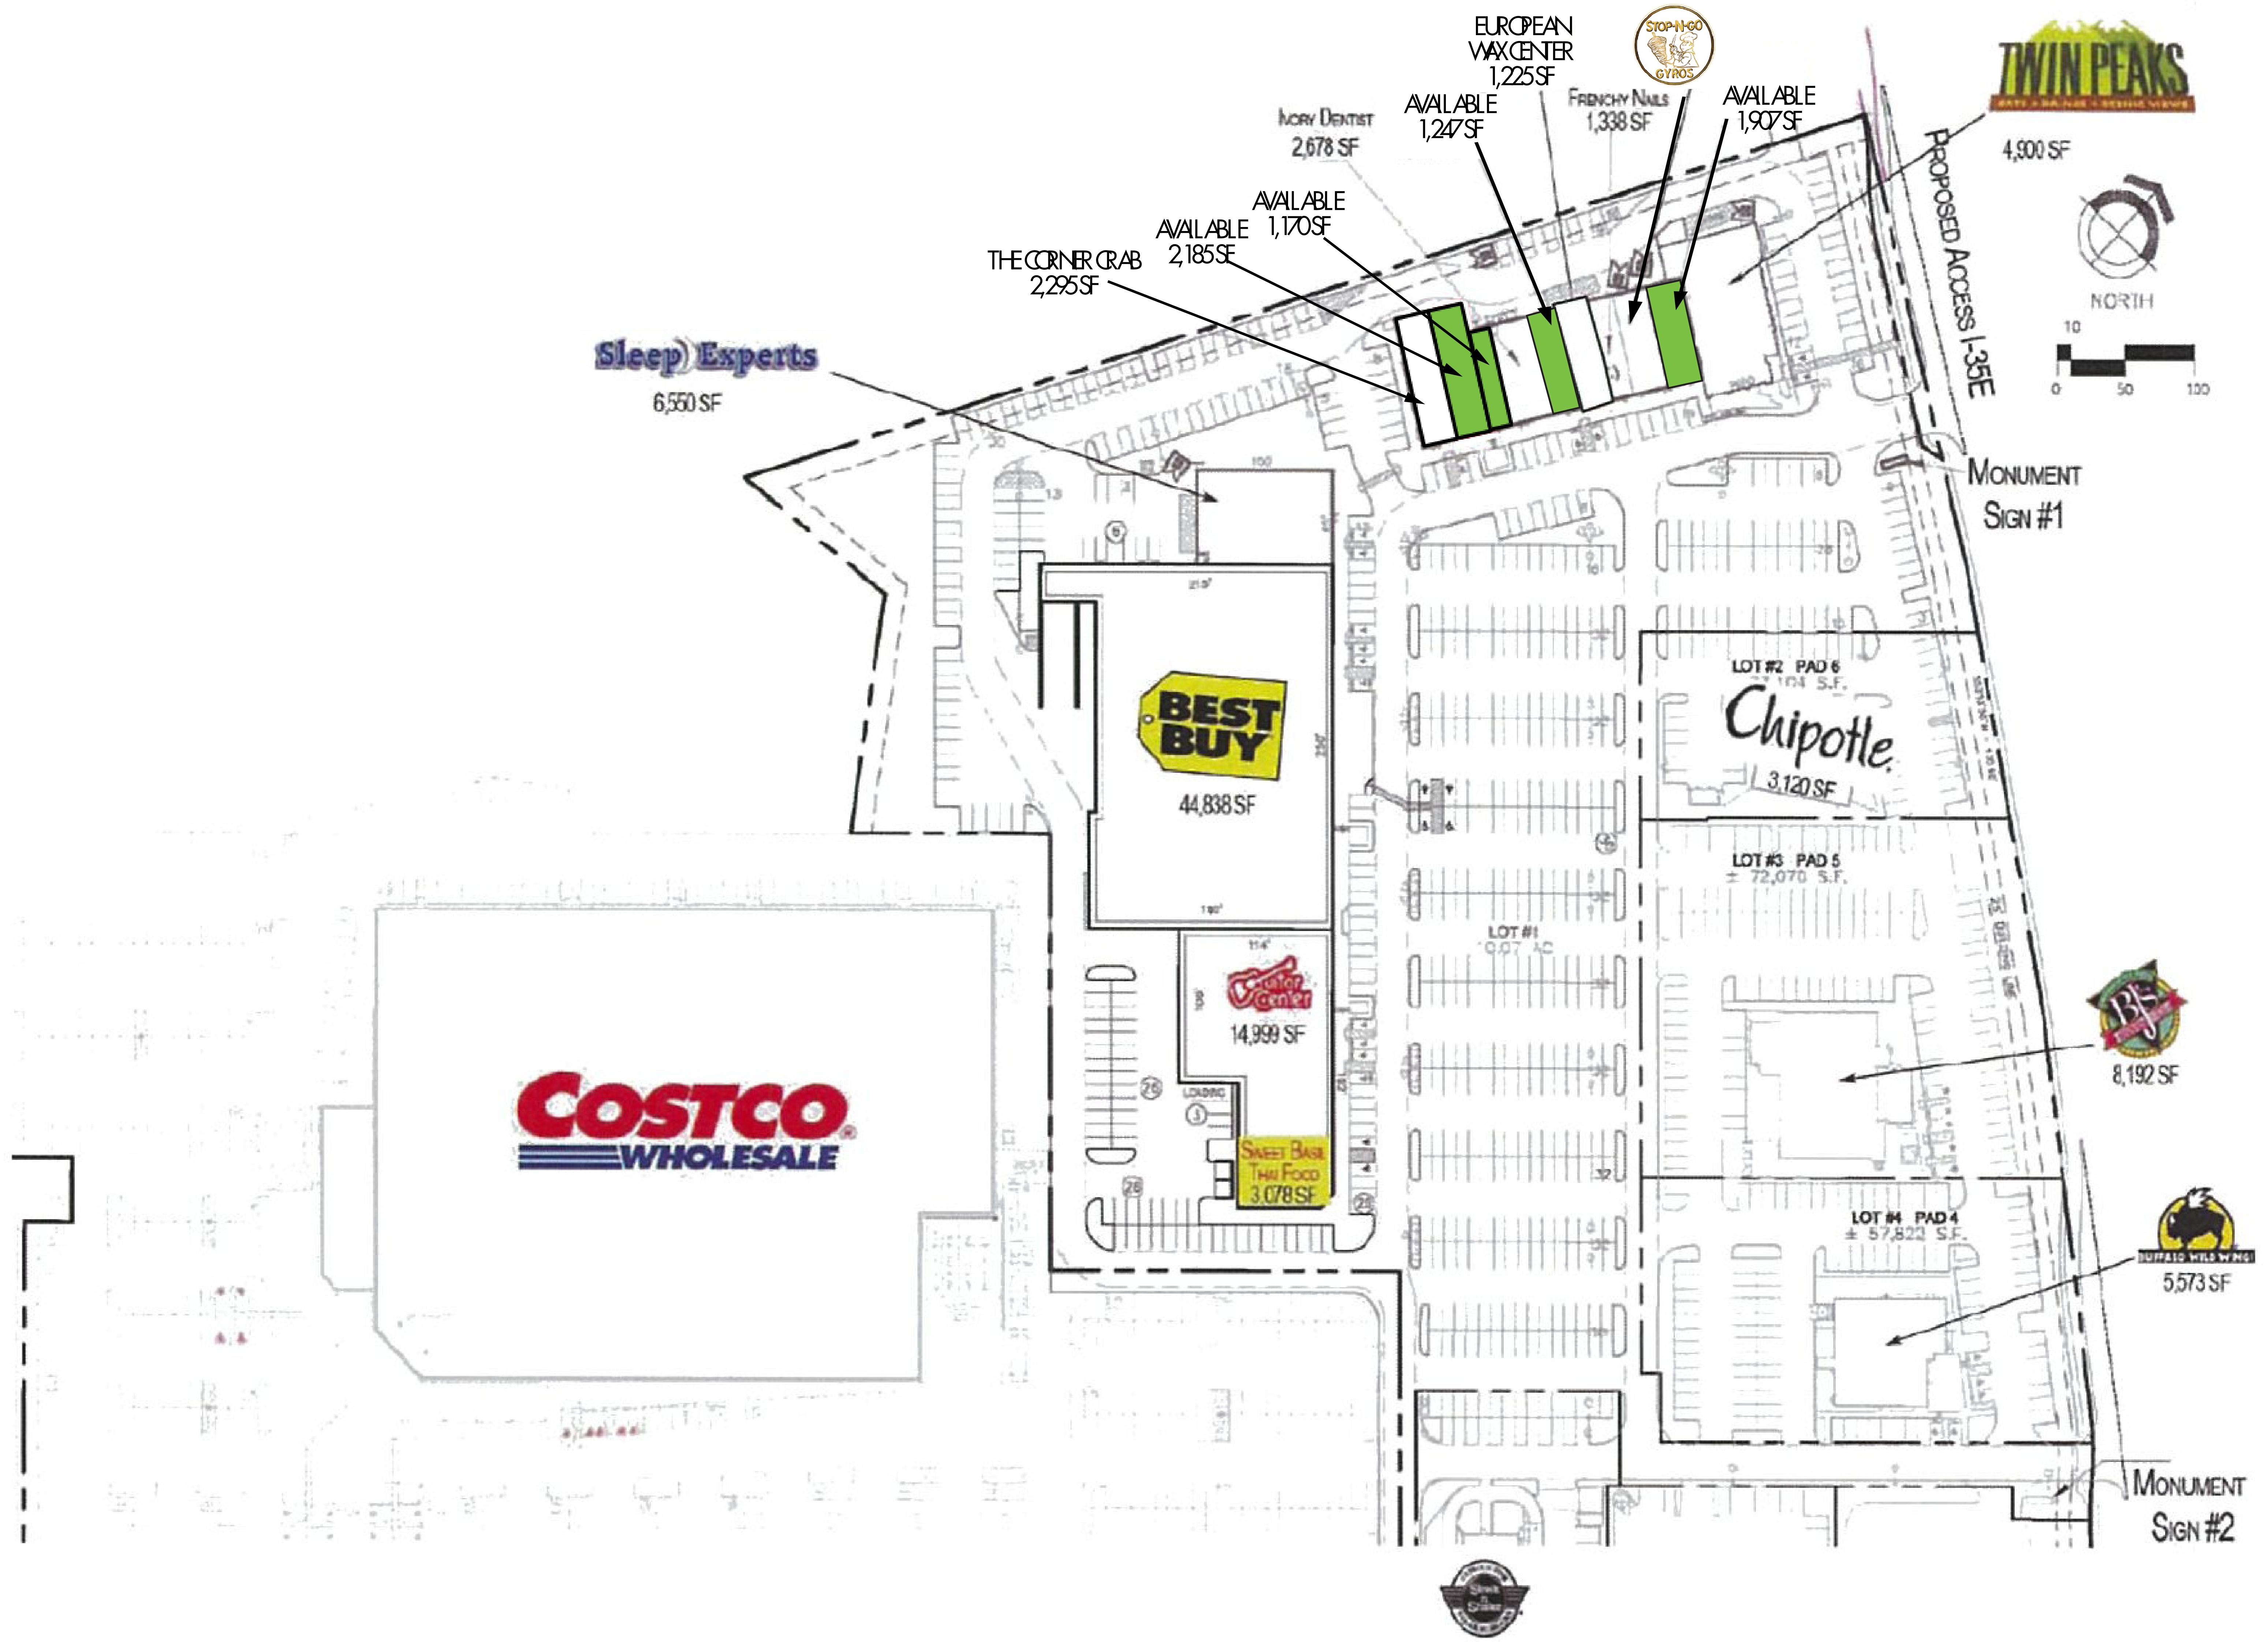 Vista Ridge Marketplace: site plan